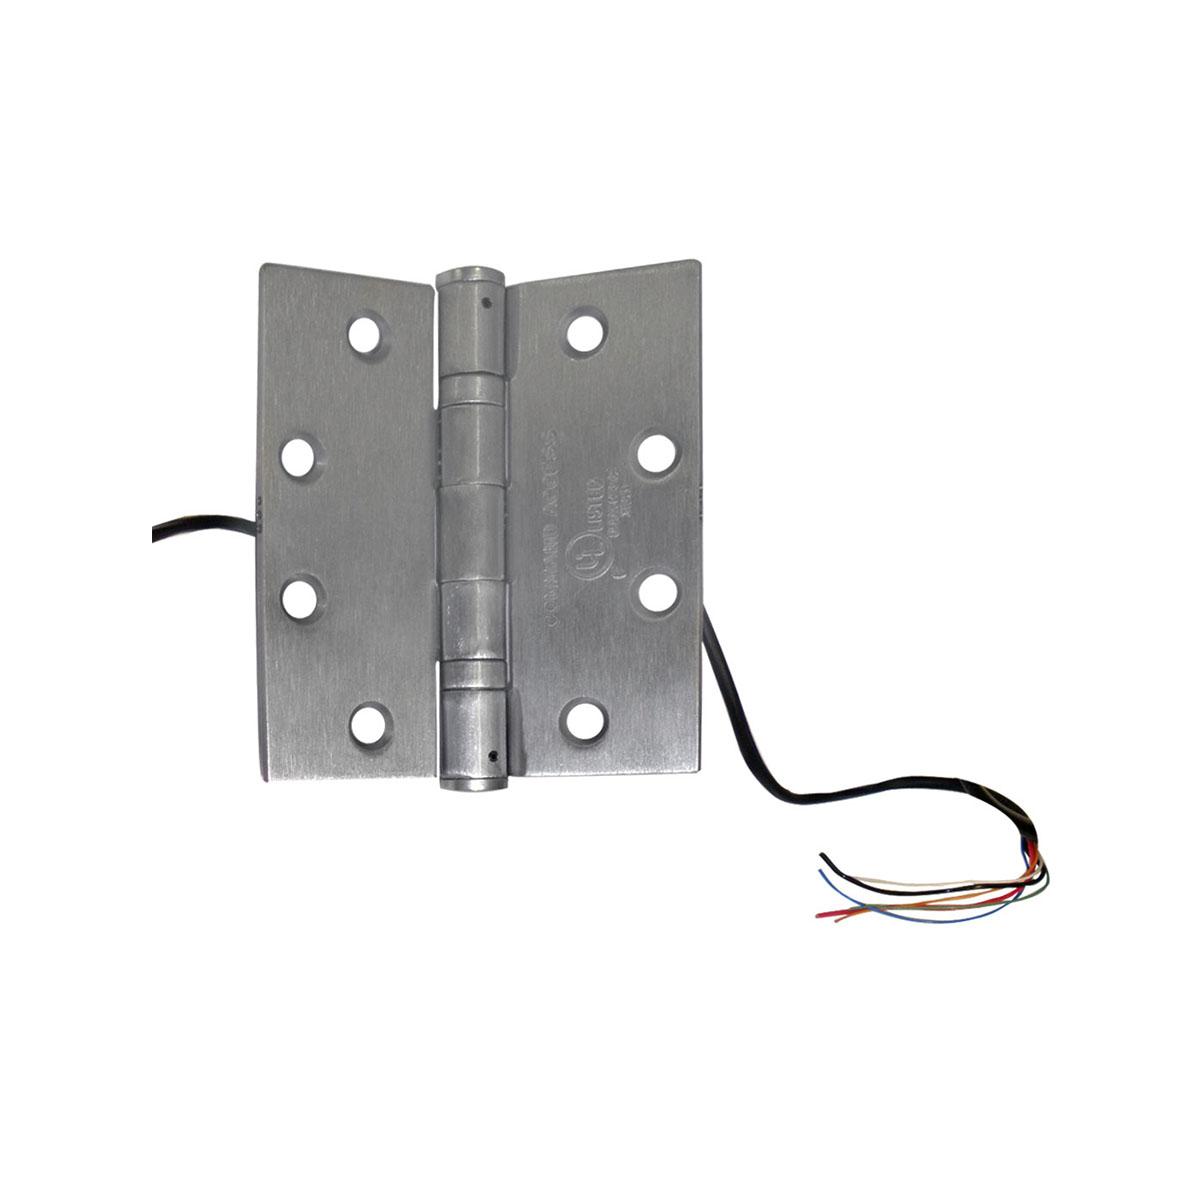 9520-9524 Electrified Hinges - Switches (RCI) | dormakaba